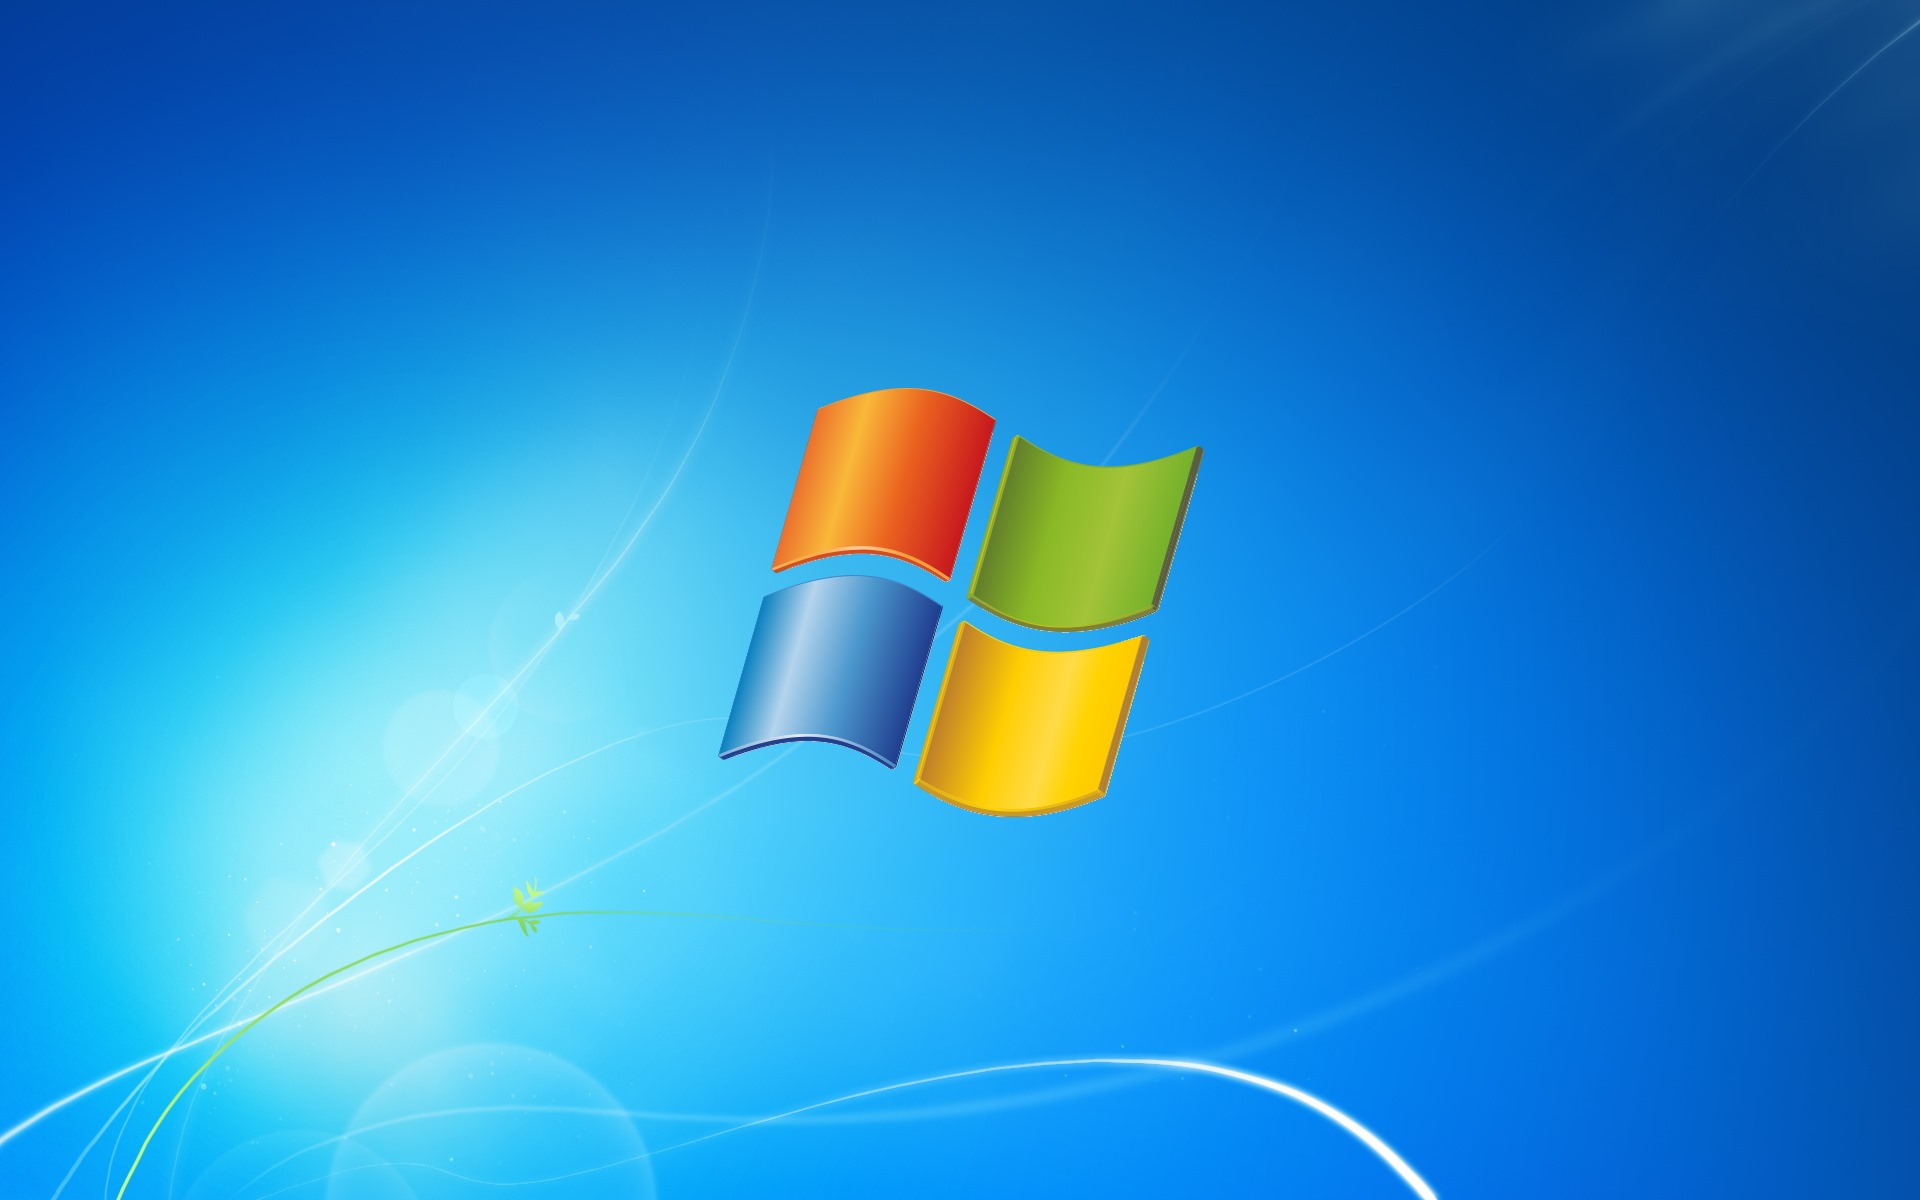 Windows Xp 3d Wallpaper Free Download Windows 8 1 Hd Wallpapers 42 Wallpapers Hd Wallpapers